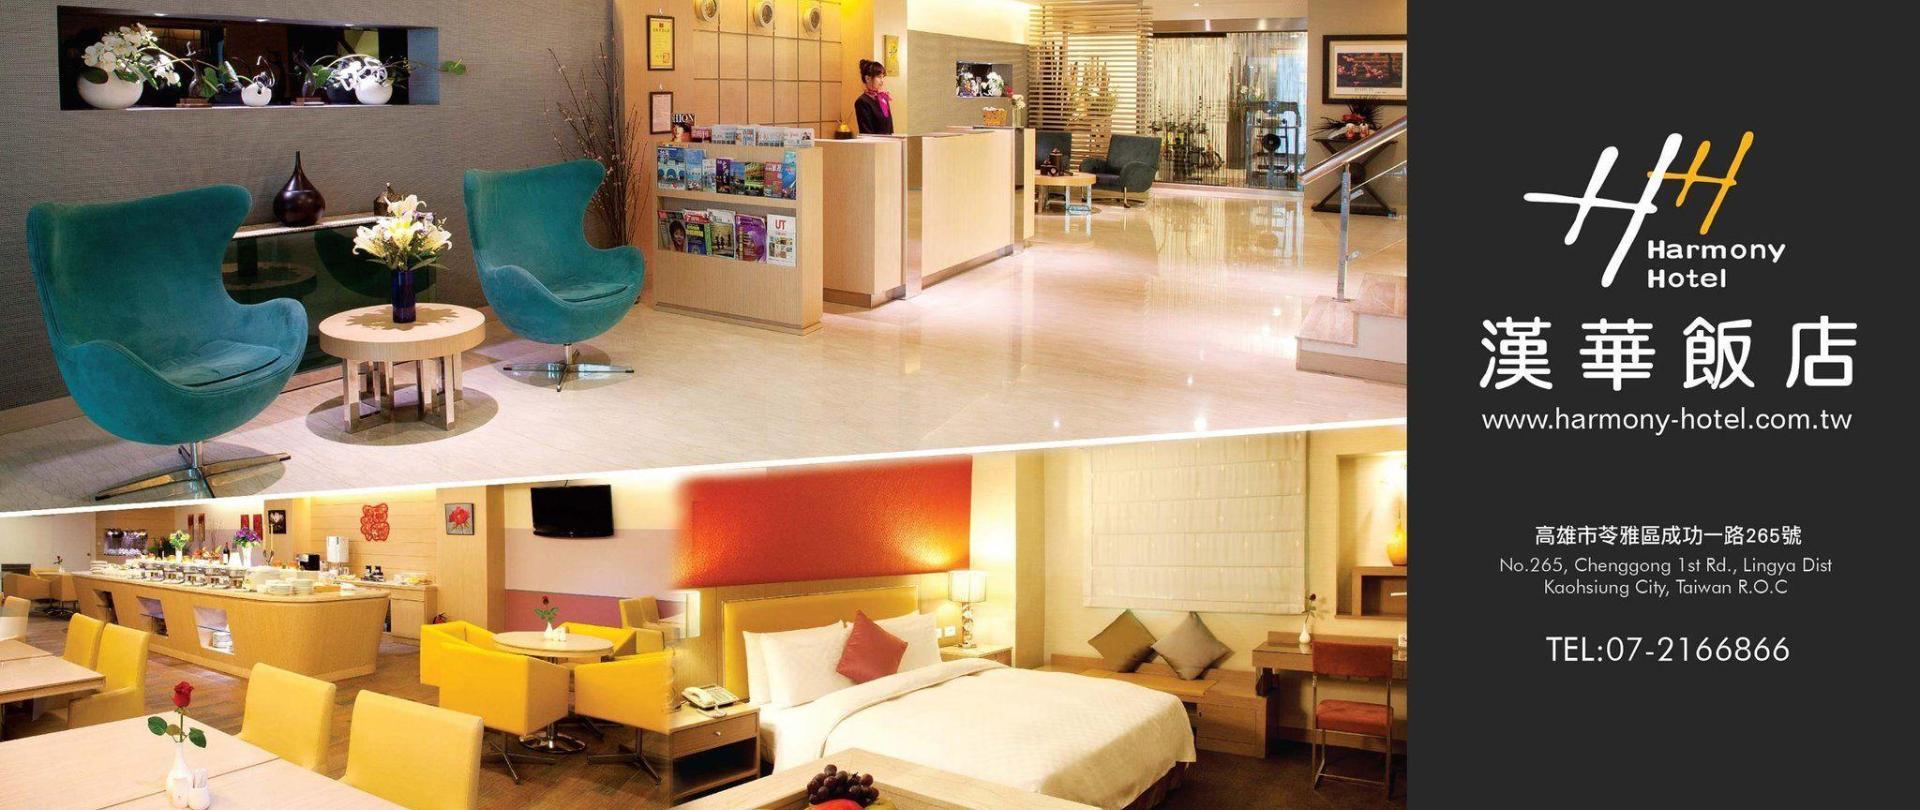 harmony-hotel.jpg